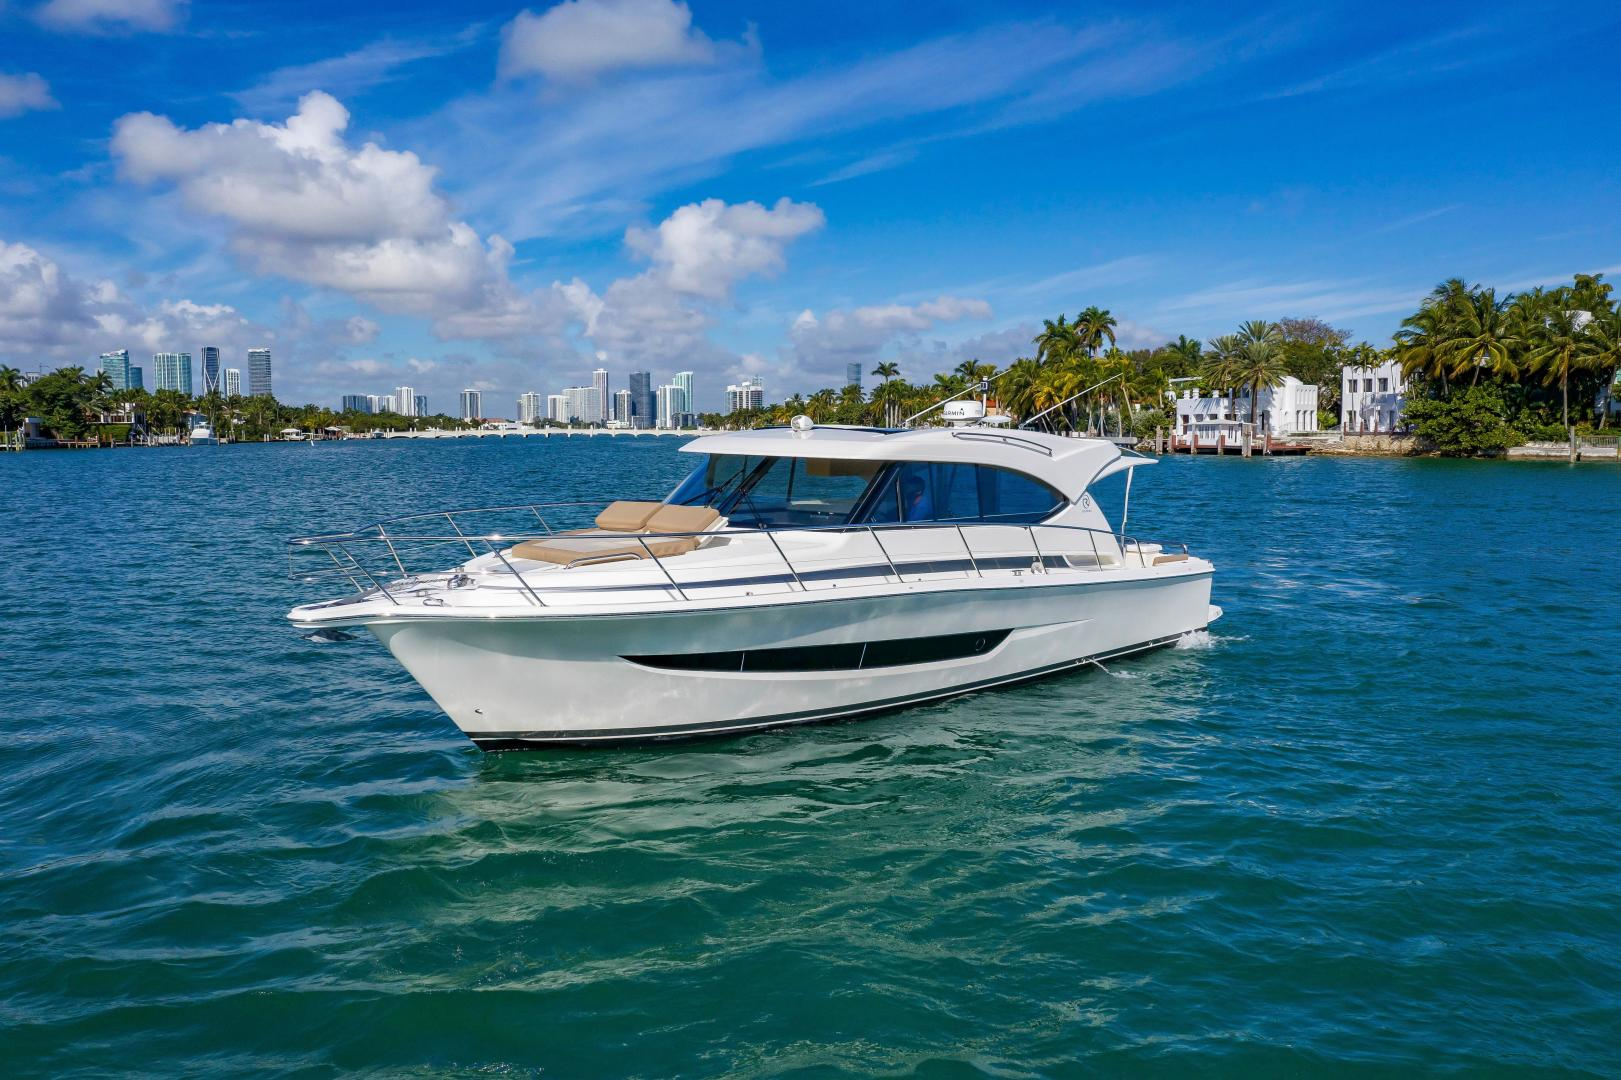 Riviera-395 SUV 2019-Ipanema Miami Beach-Florida-United States-1614864   Thumbnail